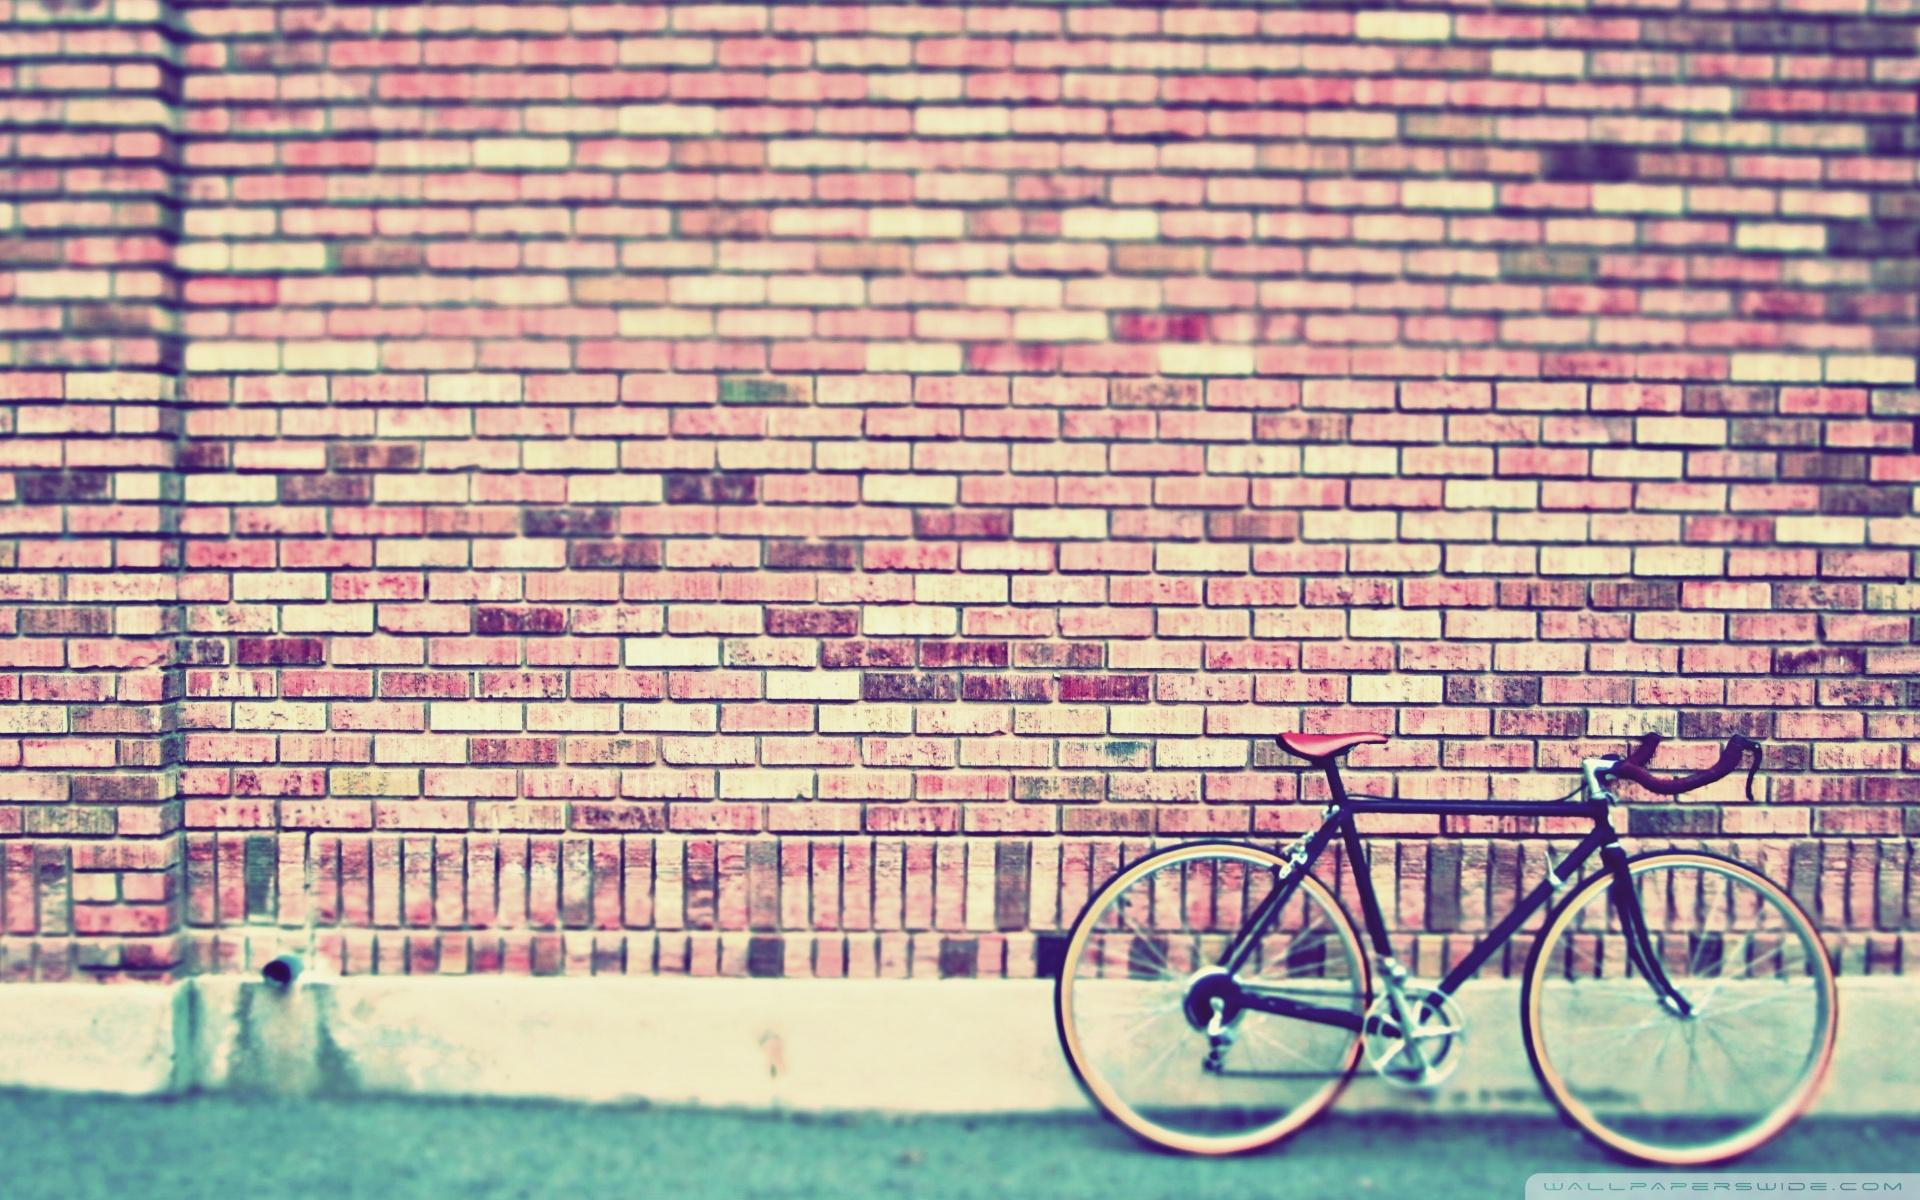 wallpaper tumblr backgrounds 1920x1200